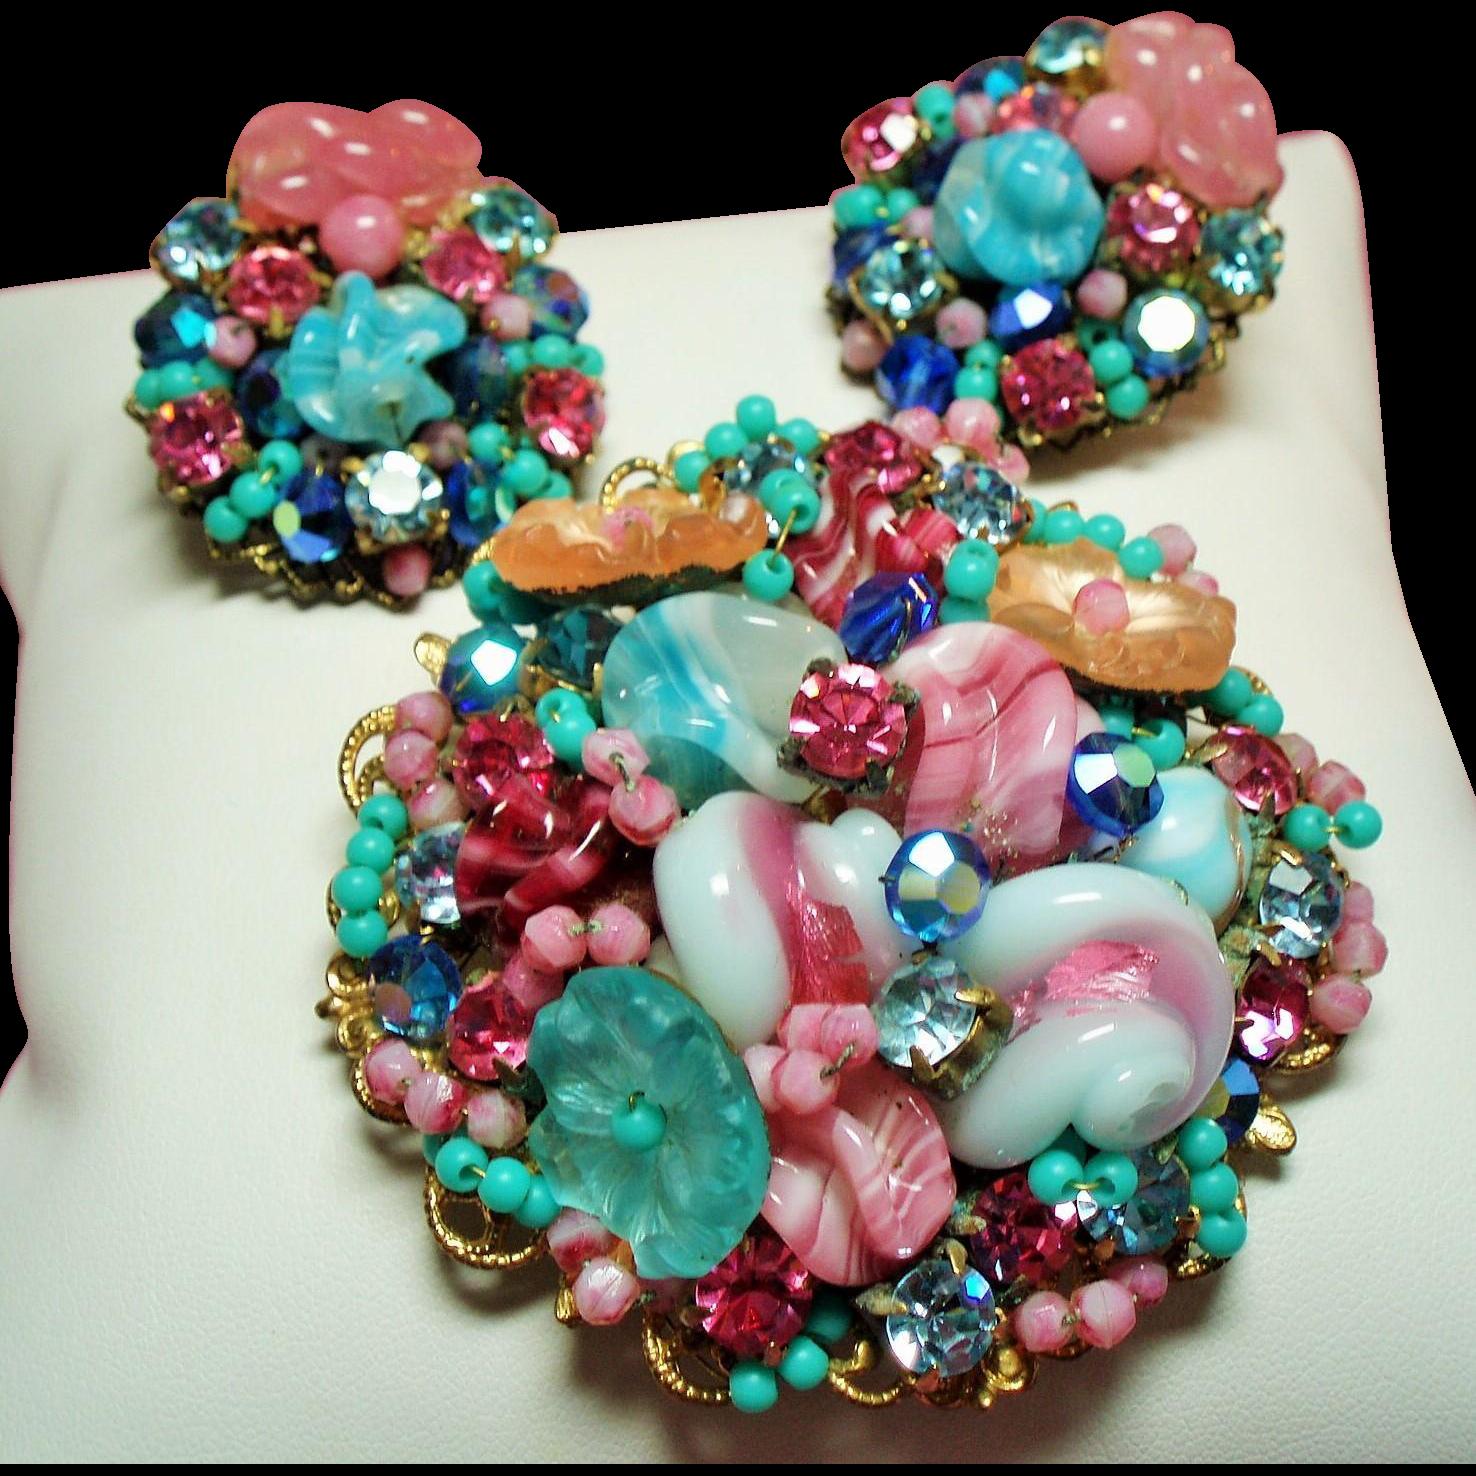 Vintage Sorbet Pate De Verre Glass Rhinestone Hand Wired Brooch Earrings Demi Parure